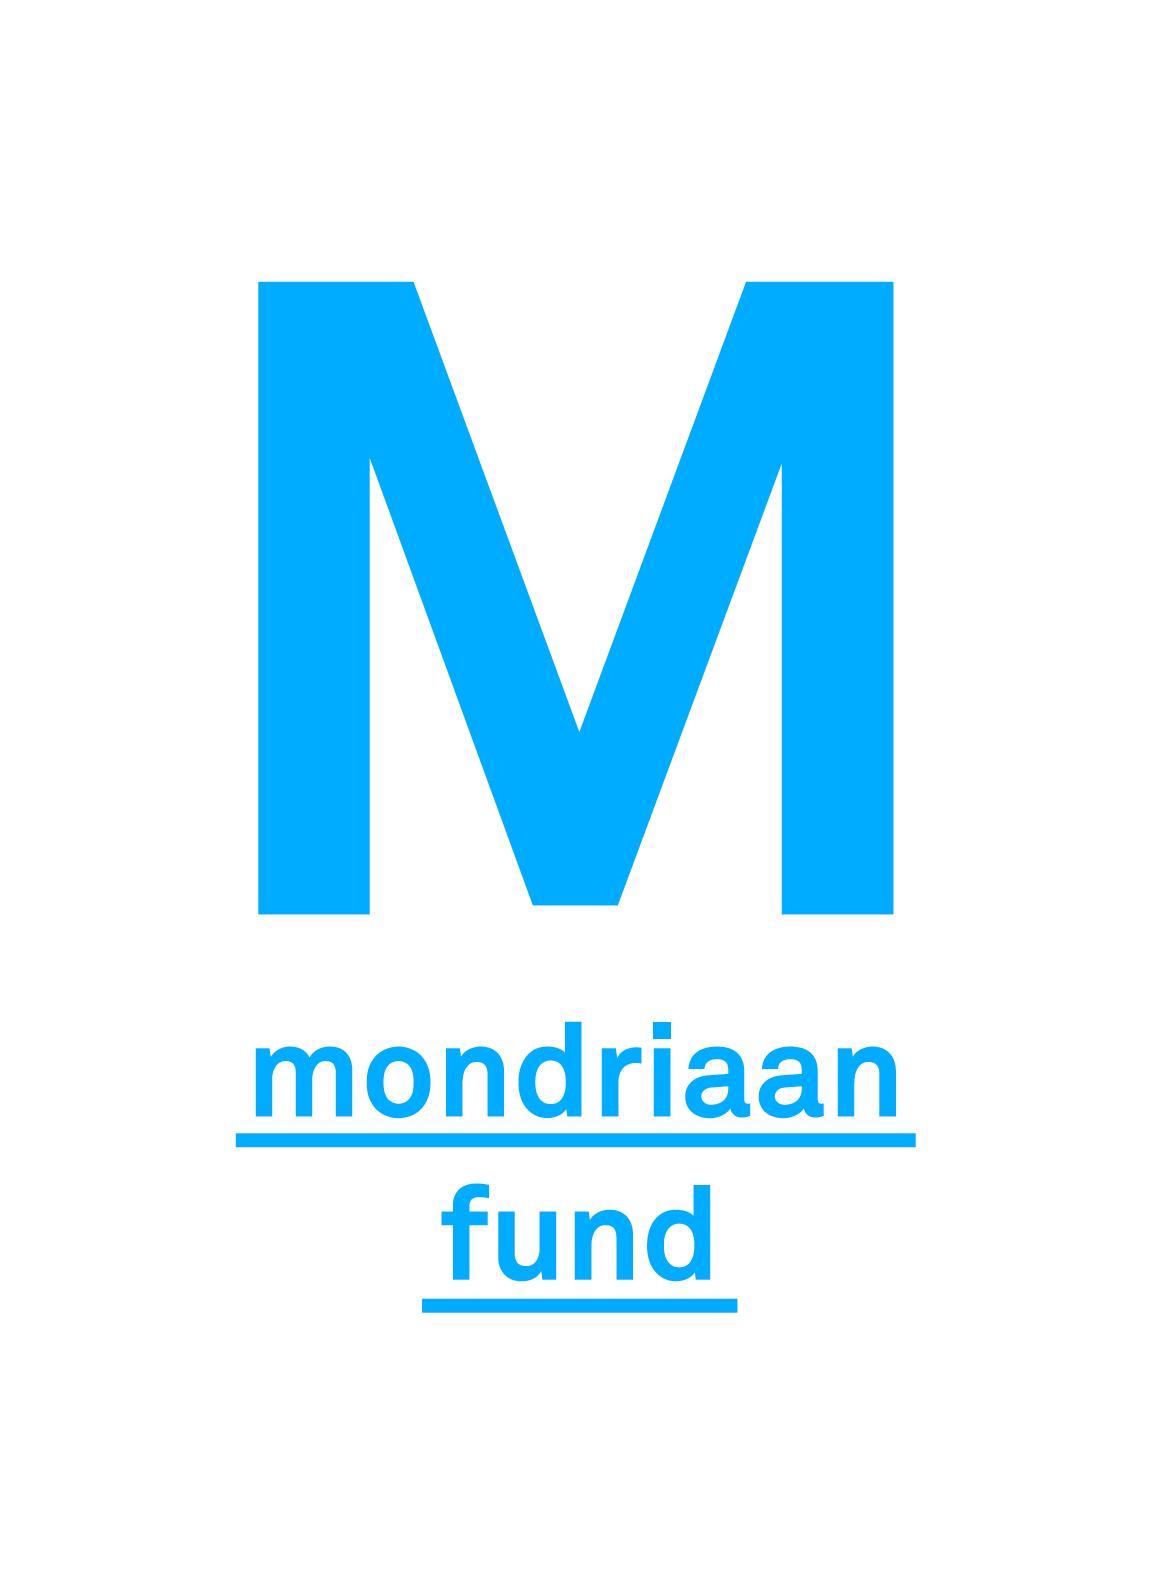 Mondriaan fund link